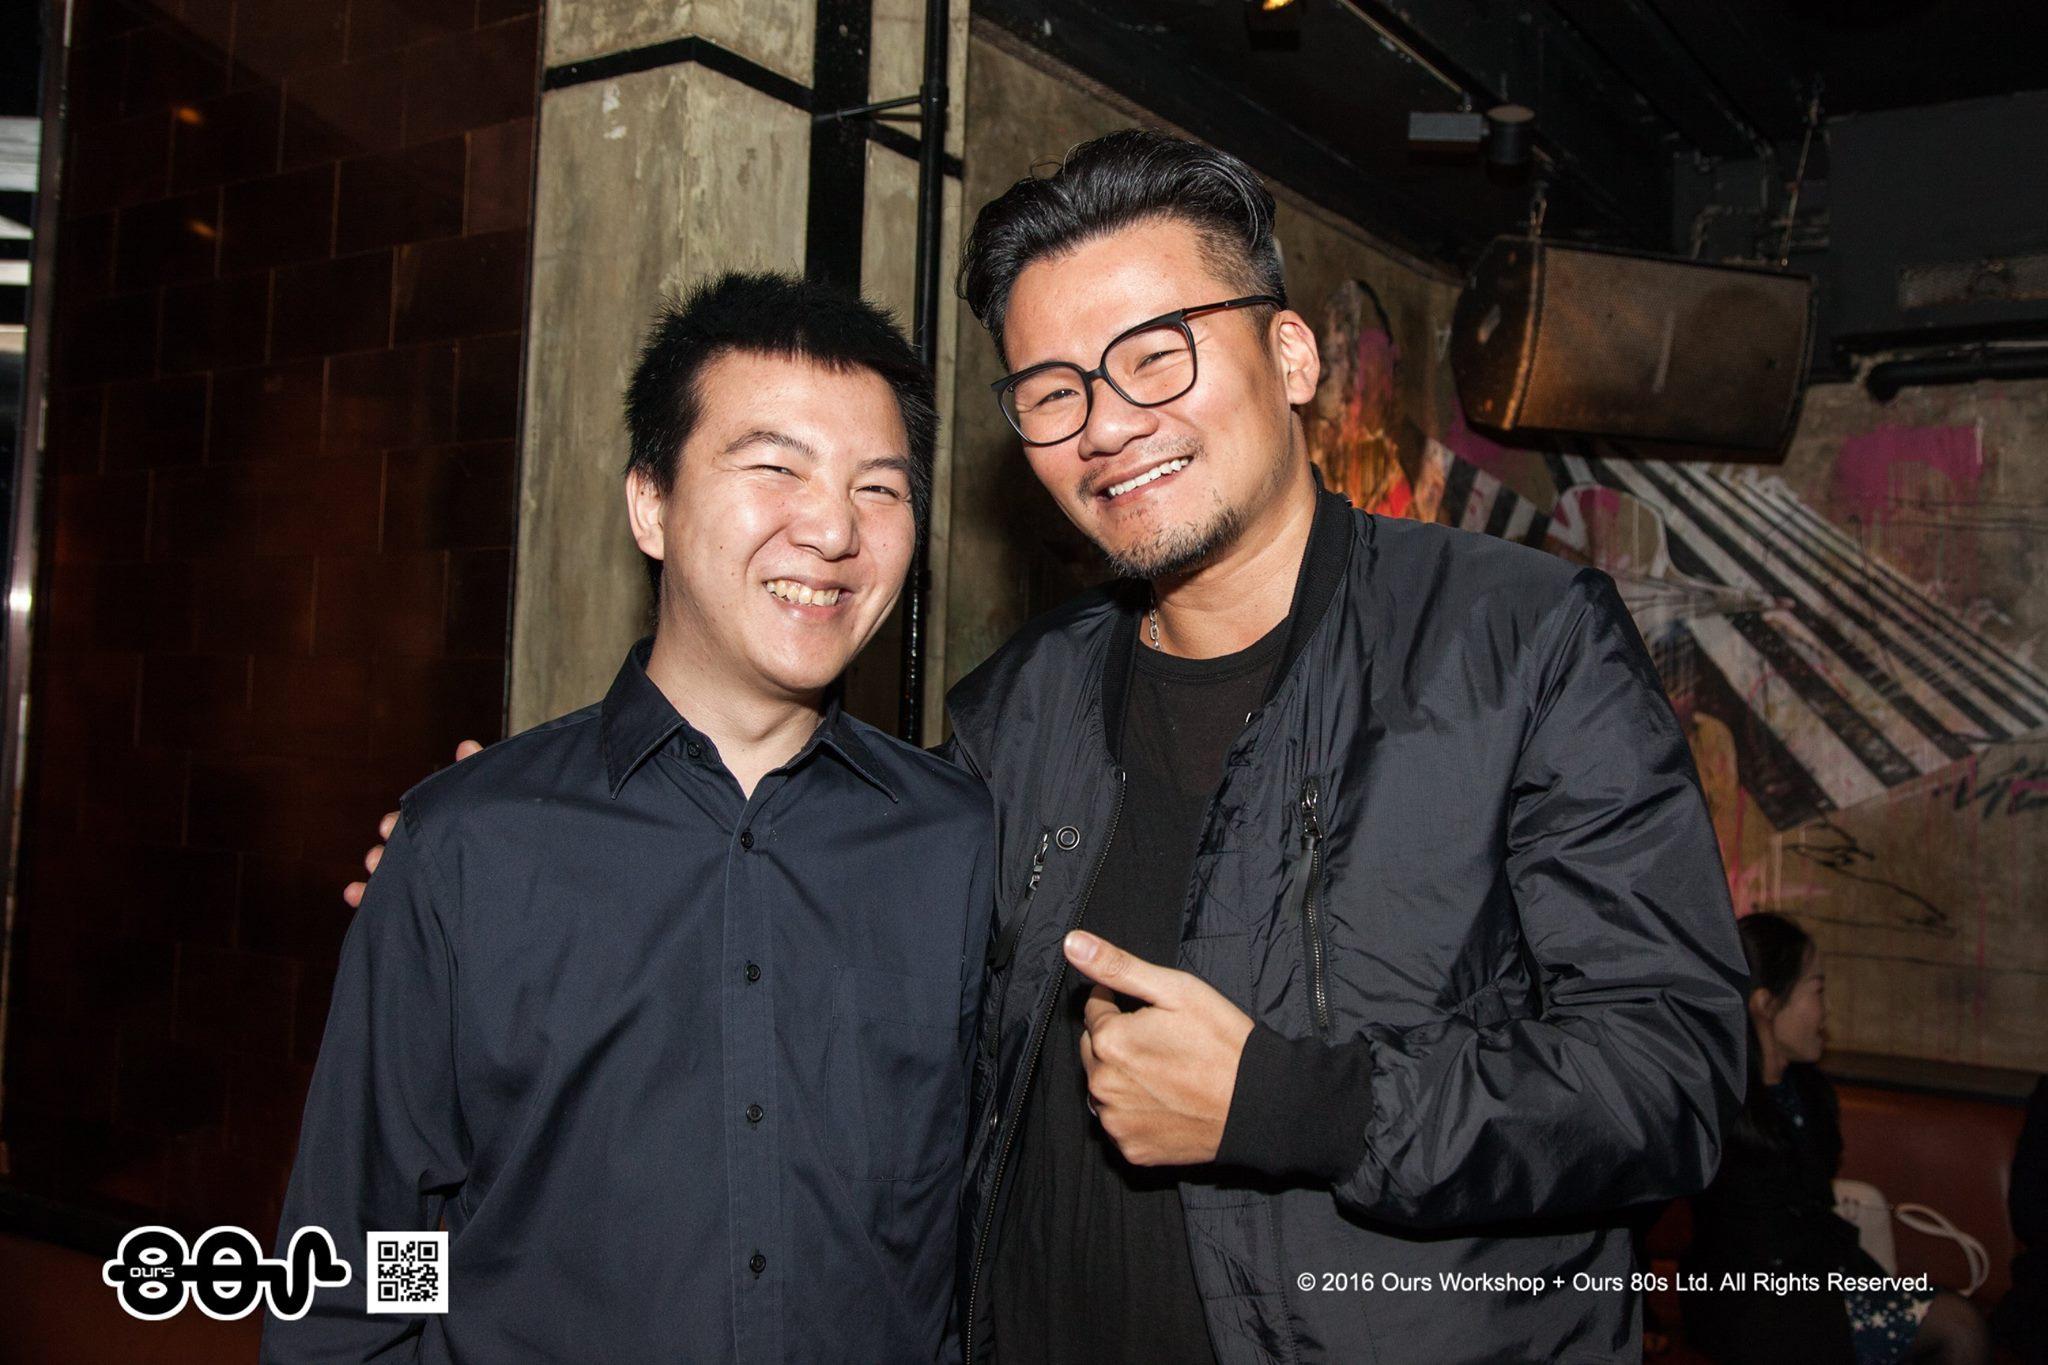 2016.12.01 RESULTS – hkclubbing.com 2016 Nightlife Awards